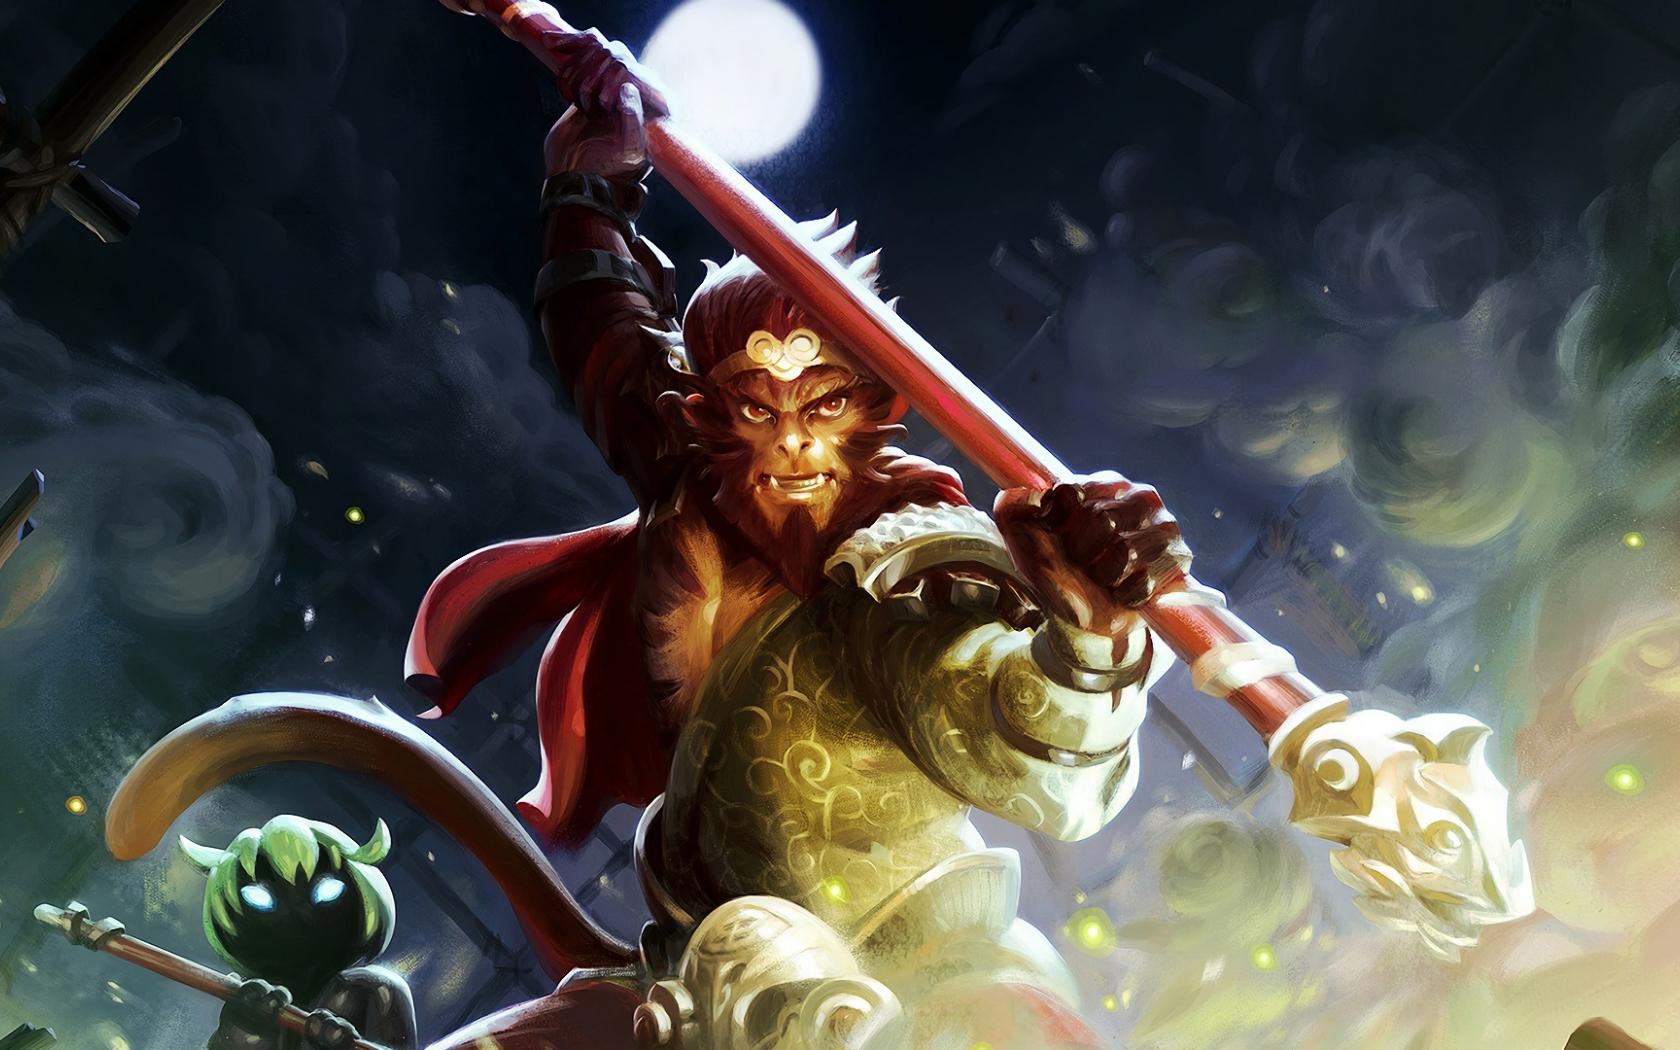 Desktop Wallpaper Monkey King Defense Of The Ancients 2 Dota 2